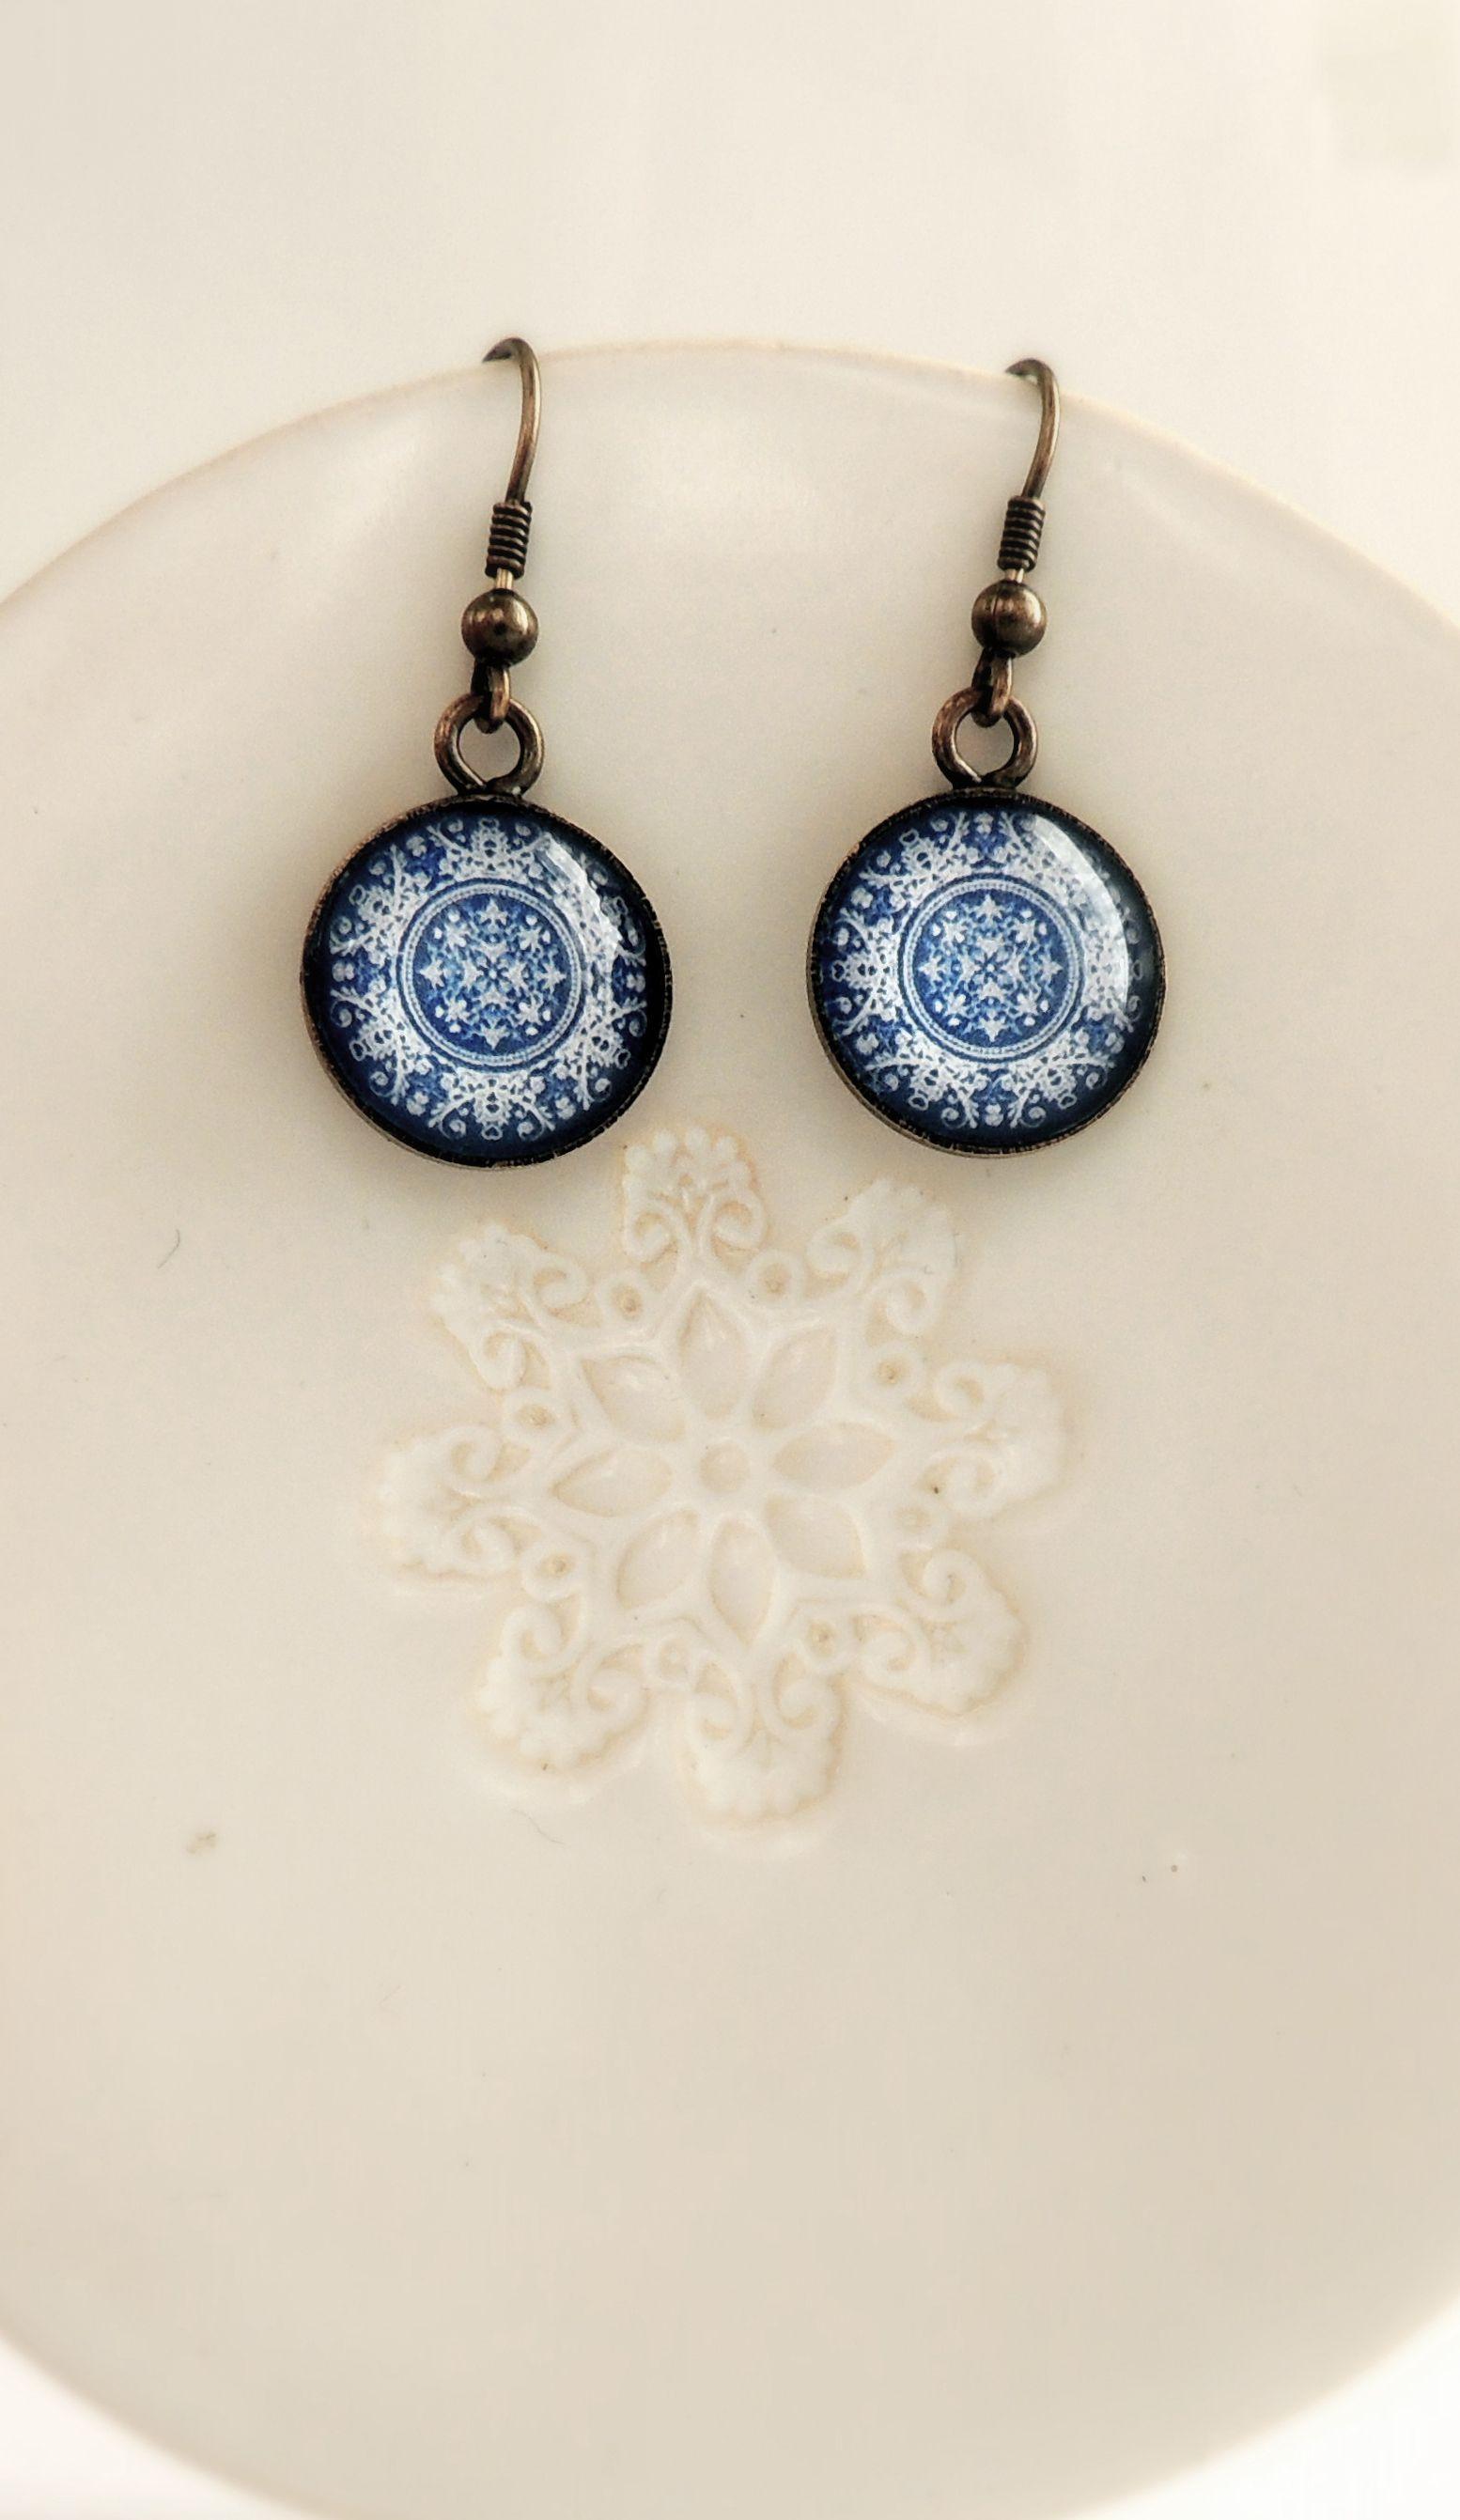 Healing Earrings Portuguese Jewelry Blue PORTUGUESE Mandala Earrings